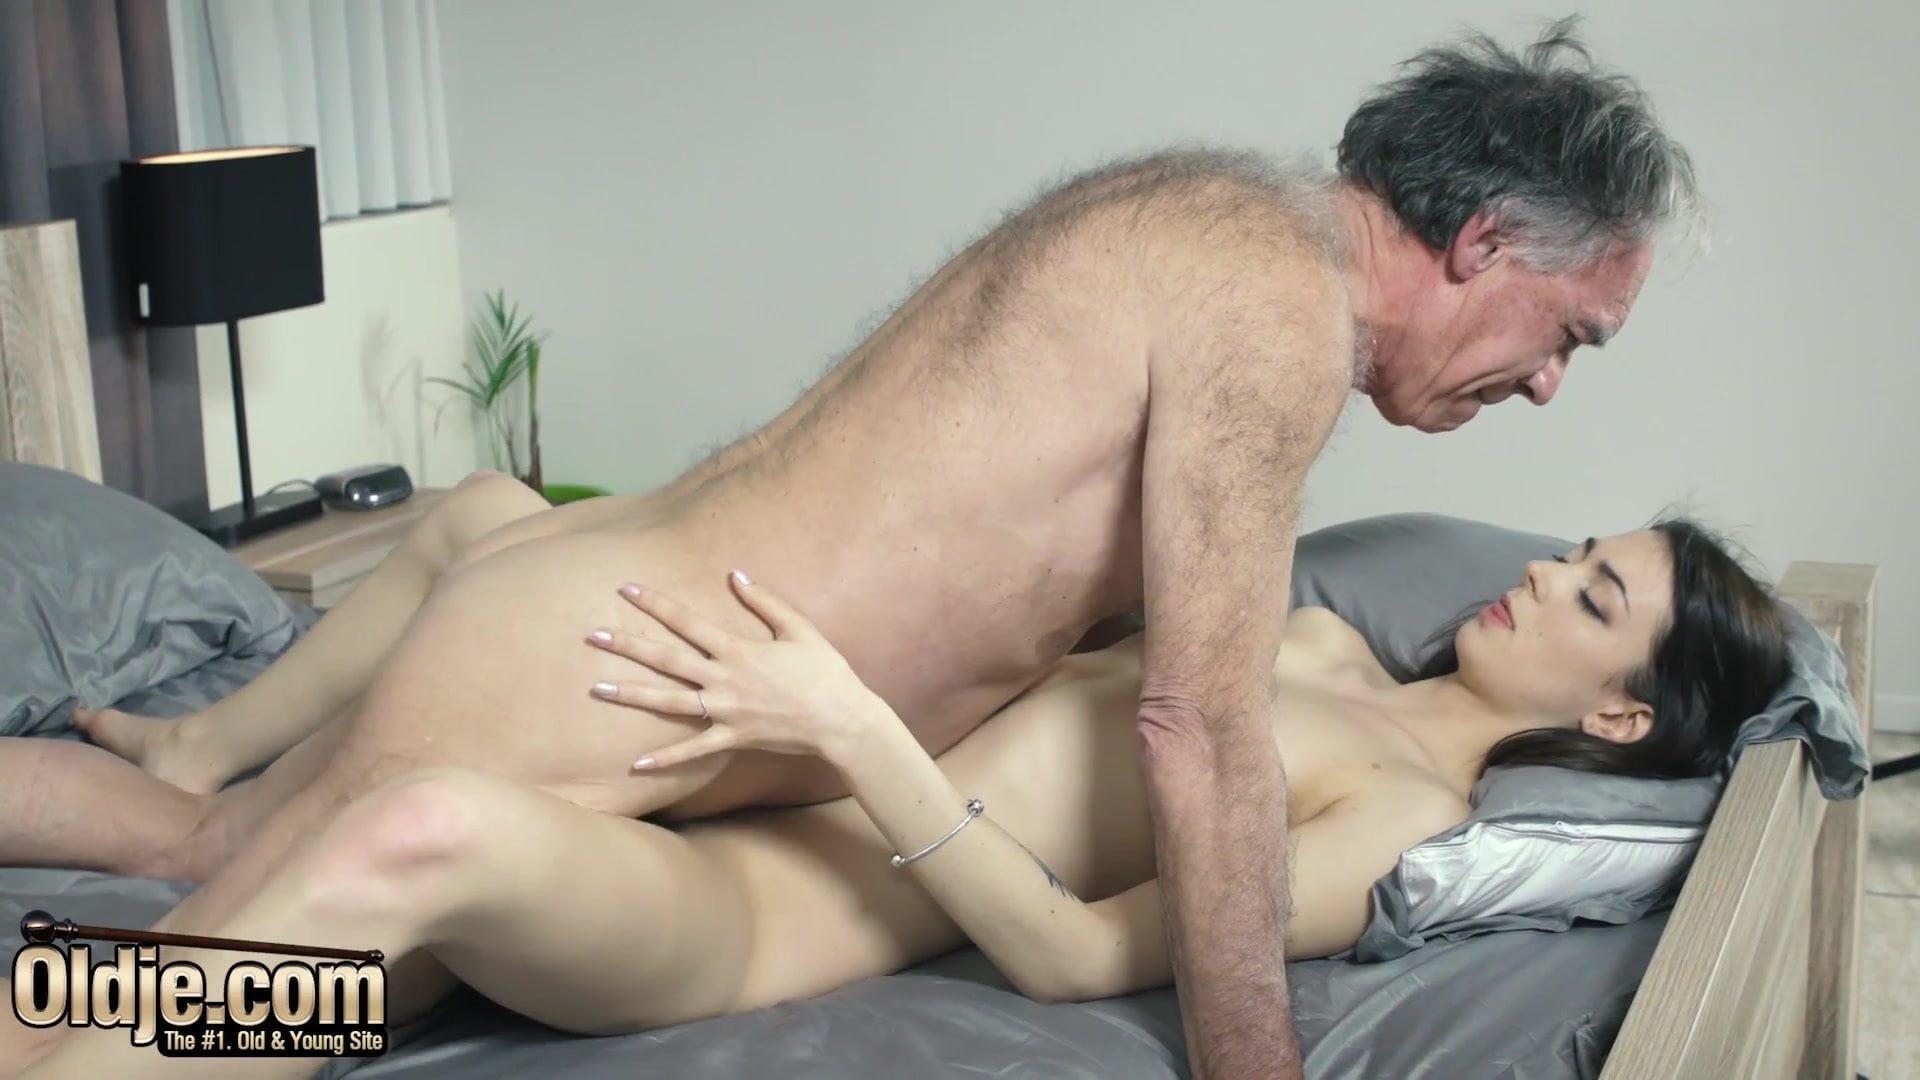 Jessica alba s naked boobs